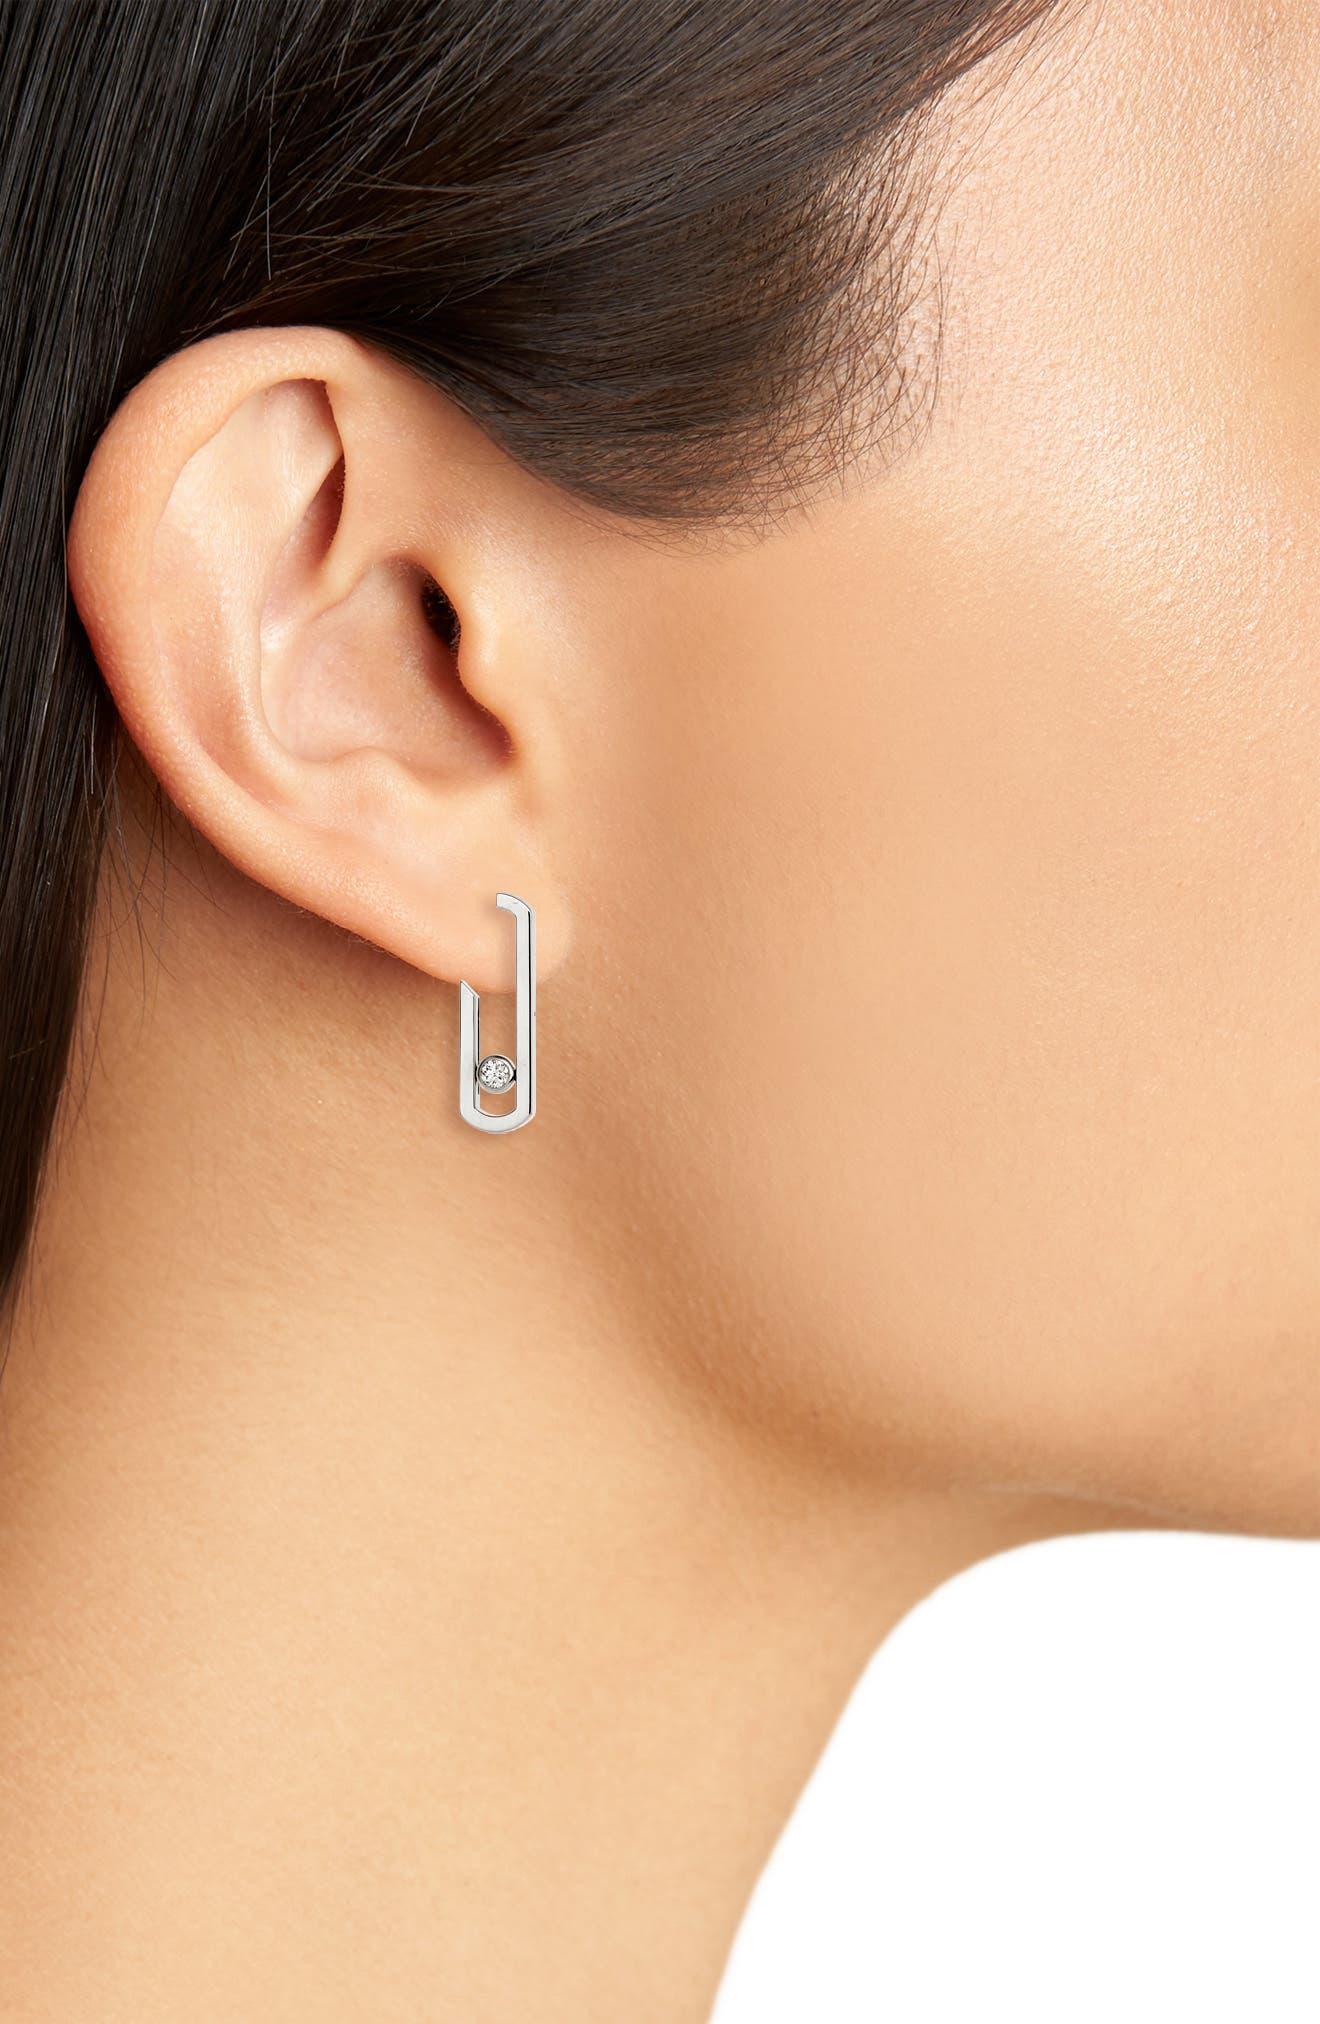 Move Addiction by Gigi Hadid Diamond Earrings,                             Alternate thumbnail 2, color,                             WHITE GOLD